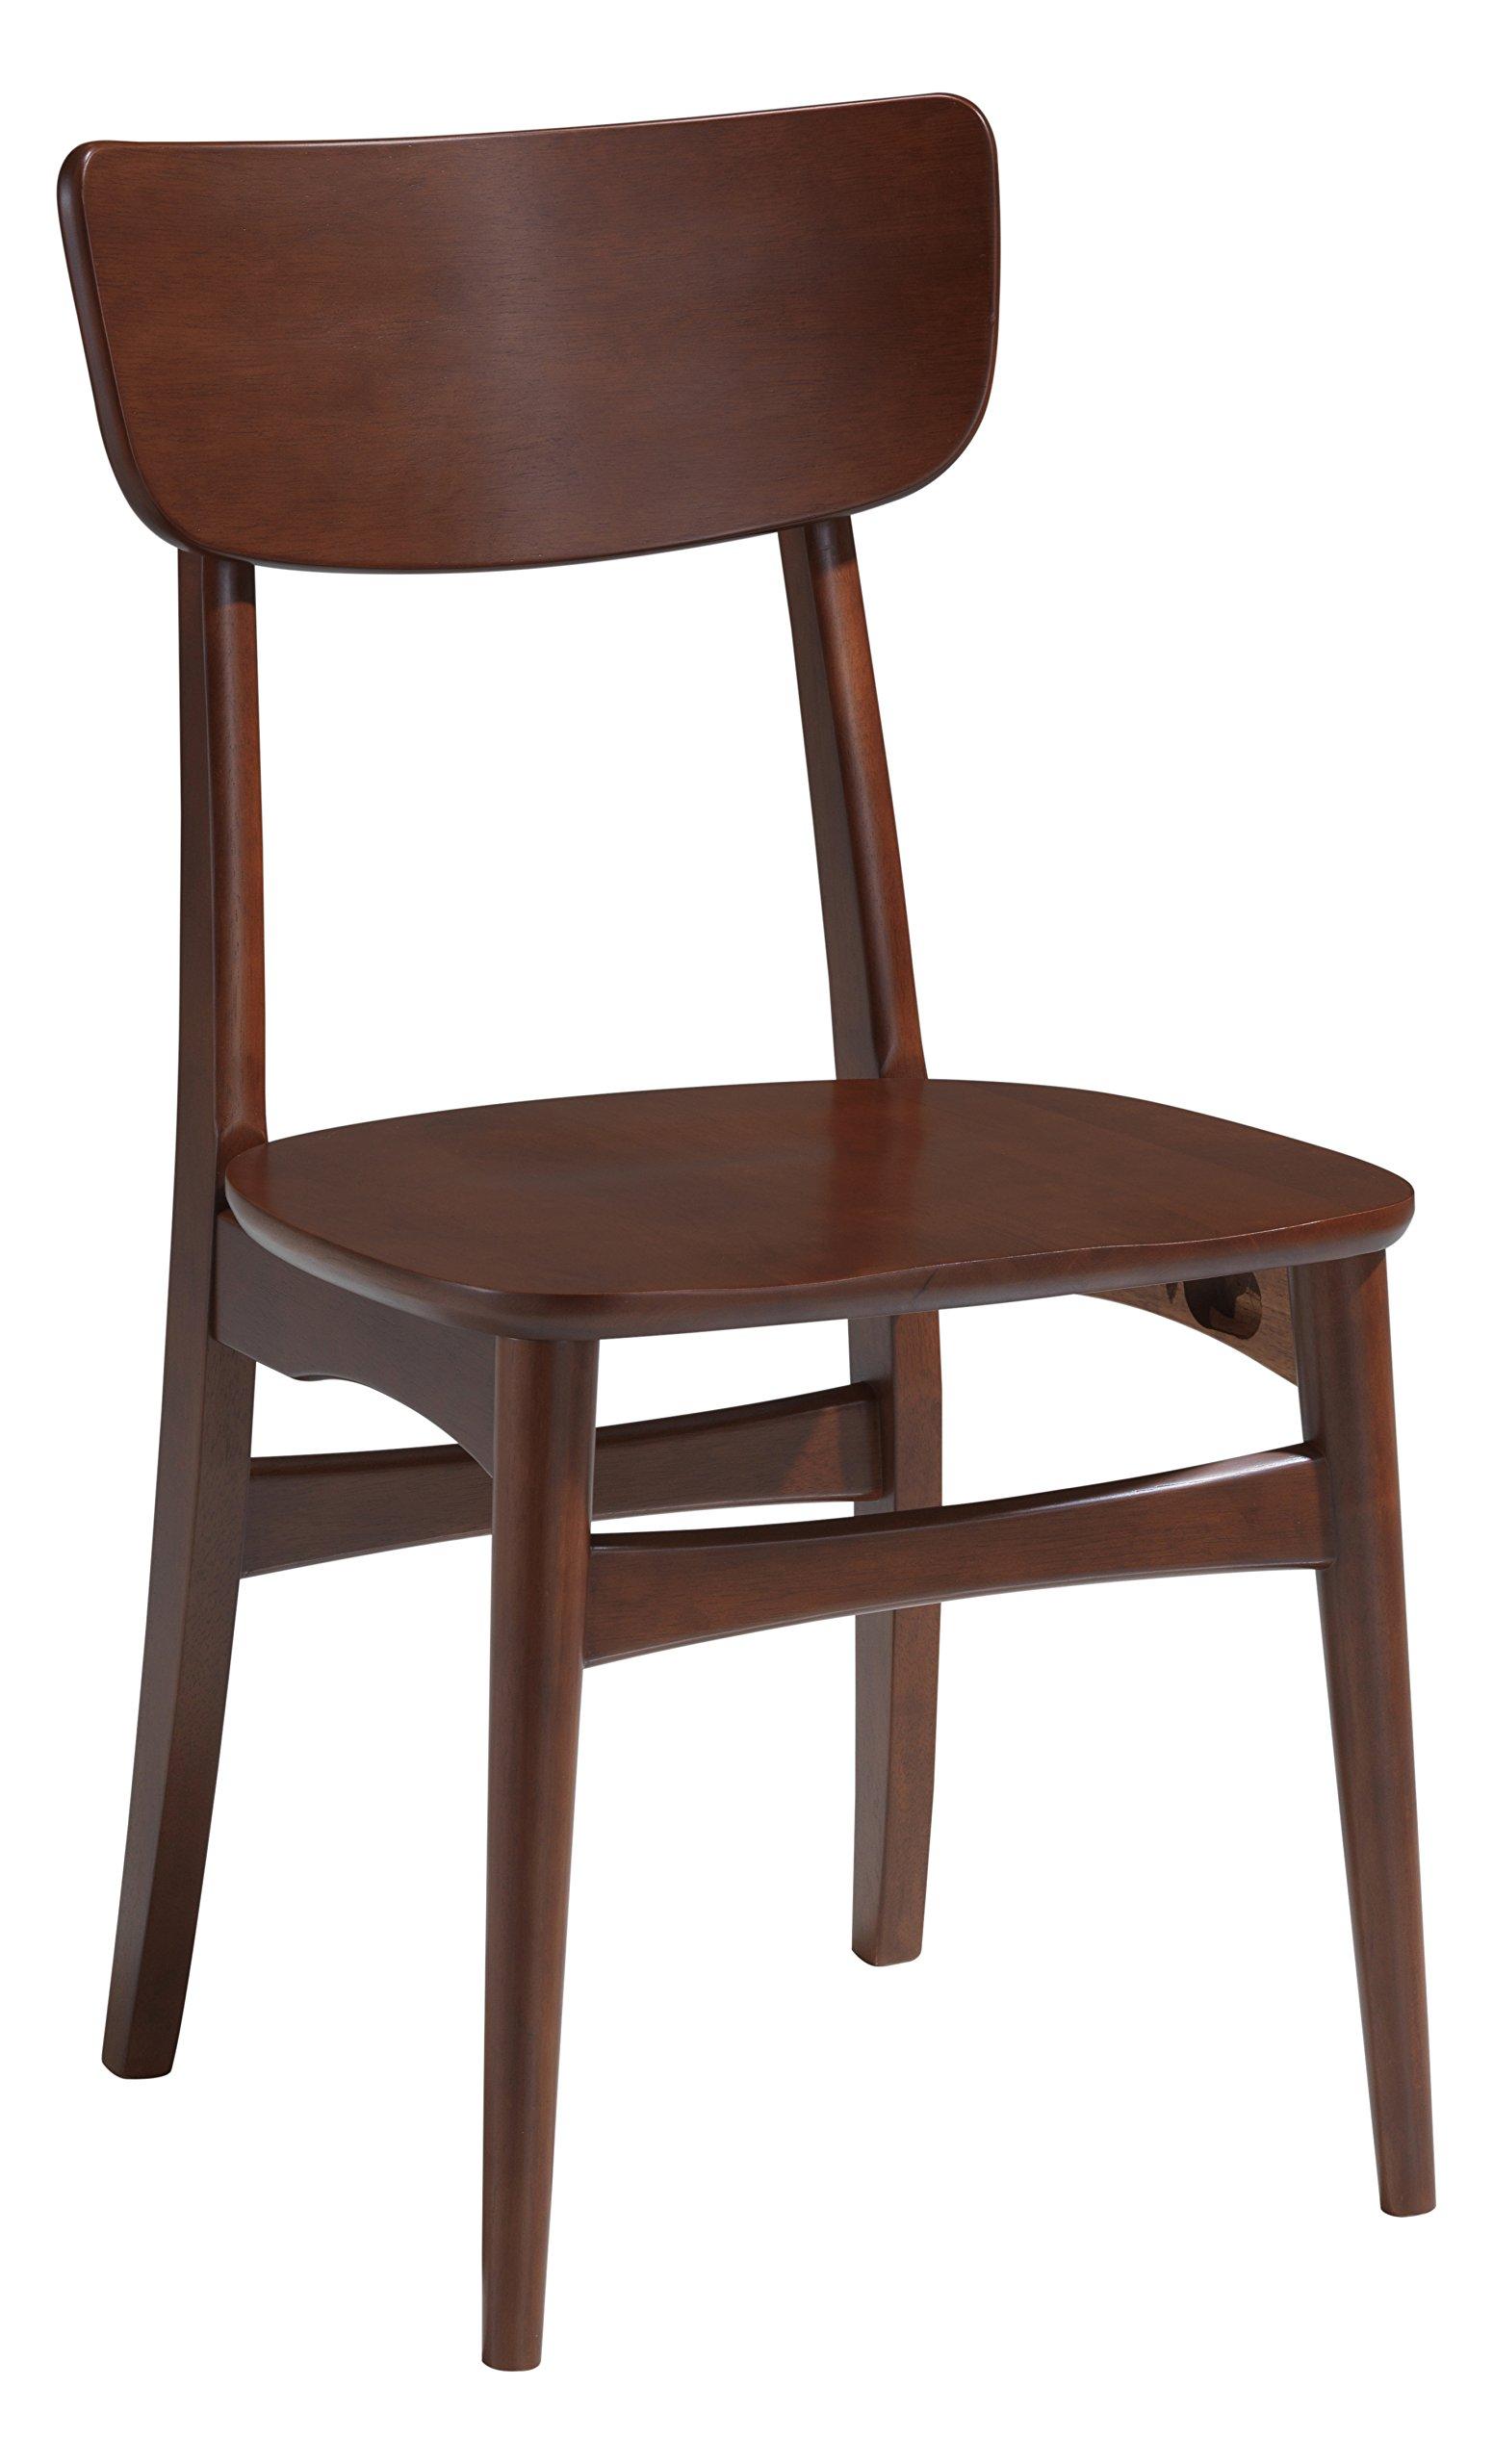 Baxton Studio Set of 2 Netherlands Mid-Century Modern Scandinavian Style Dark Walnut Bentwood Dining Side Chairs - 2-piece mid-century modern dining chair set Materials: Solid rubber wood and MDF with brown wood veneer Rich walnut-veneer finish - kitchen-dining-room-furniture, kitchen-dining-room, kitchen-dining-room-chairs - 71Oq lX6ckL -